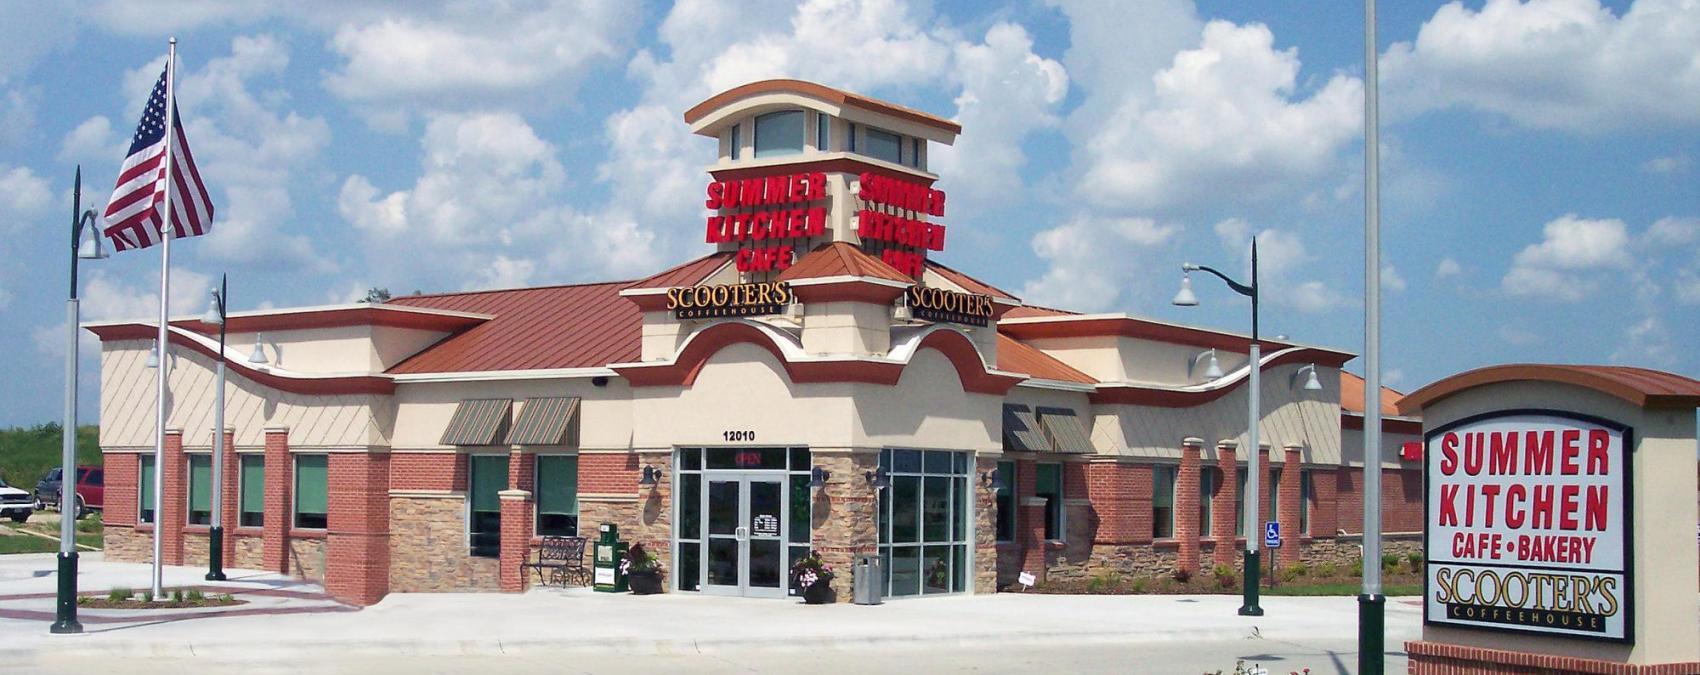 Nice Summer Kitchen Cafe   La Vista | Darland Construction   Building To A  Higher Standard